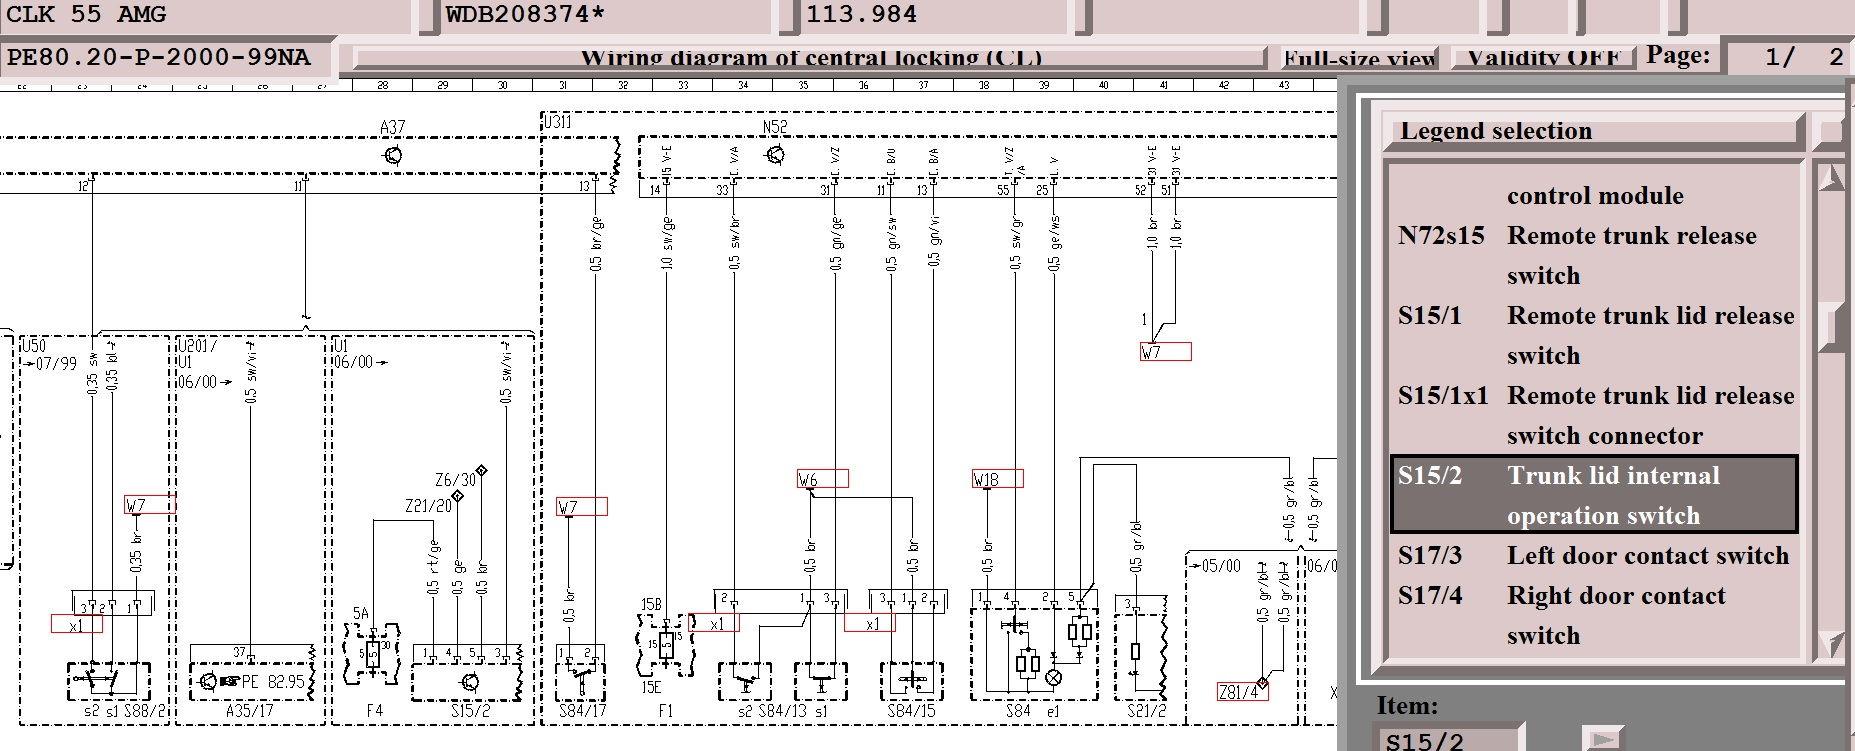 2000 Mercedes S430 Fuse Chart Diagram